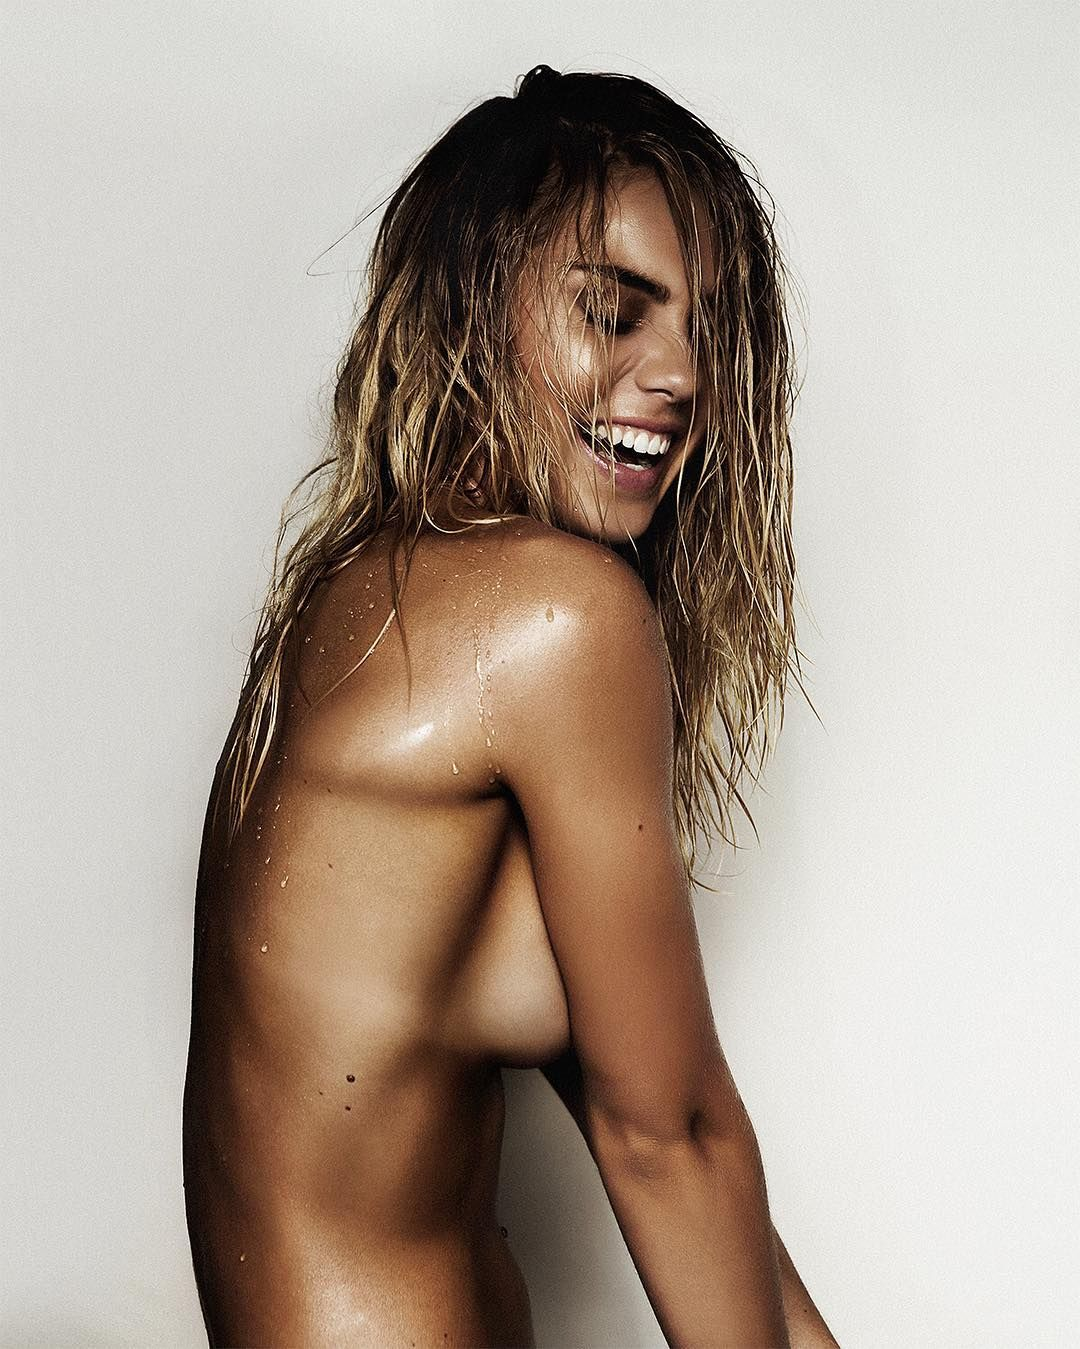 Bikini Instagram Elyse Knowles naked photo 2017